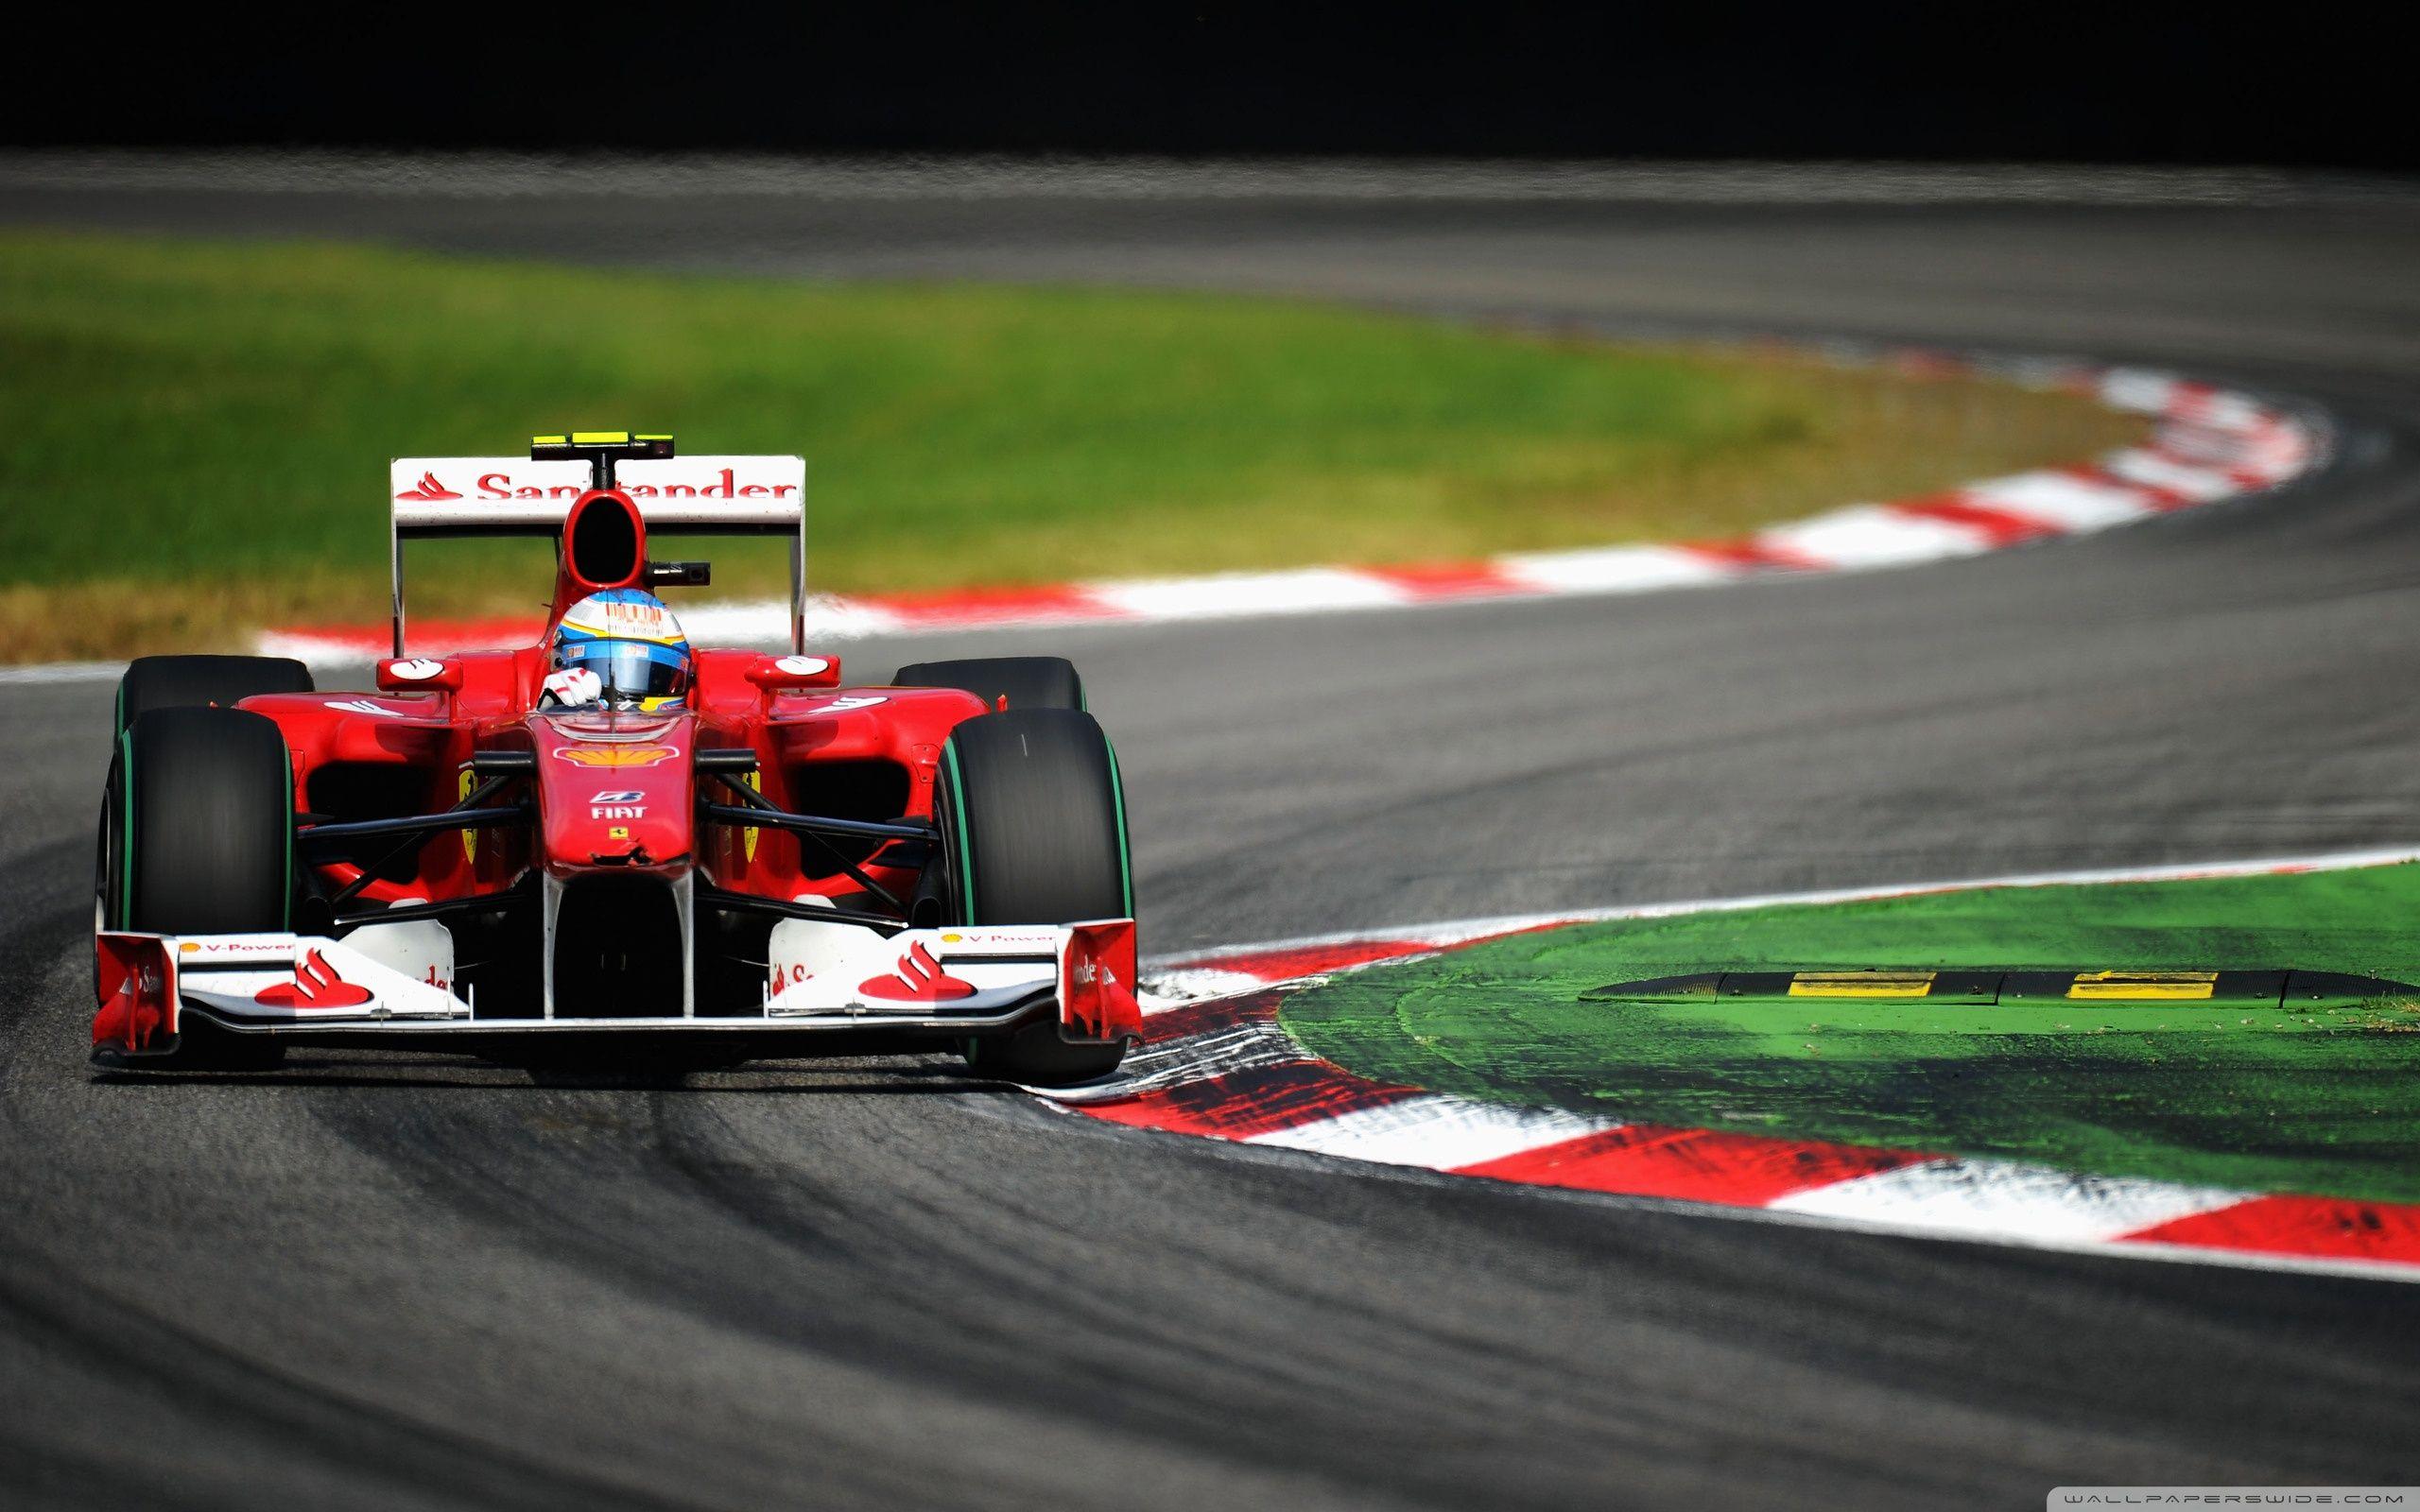 Fast Car Formula 1 Auto Sport Sports Car Racing Formula 1 Racing